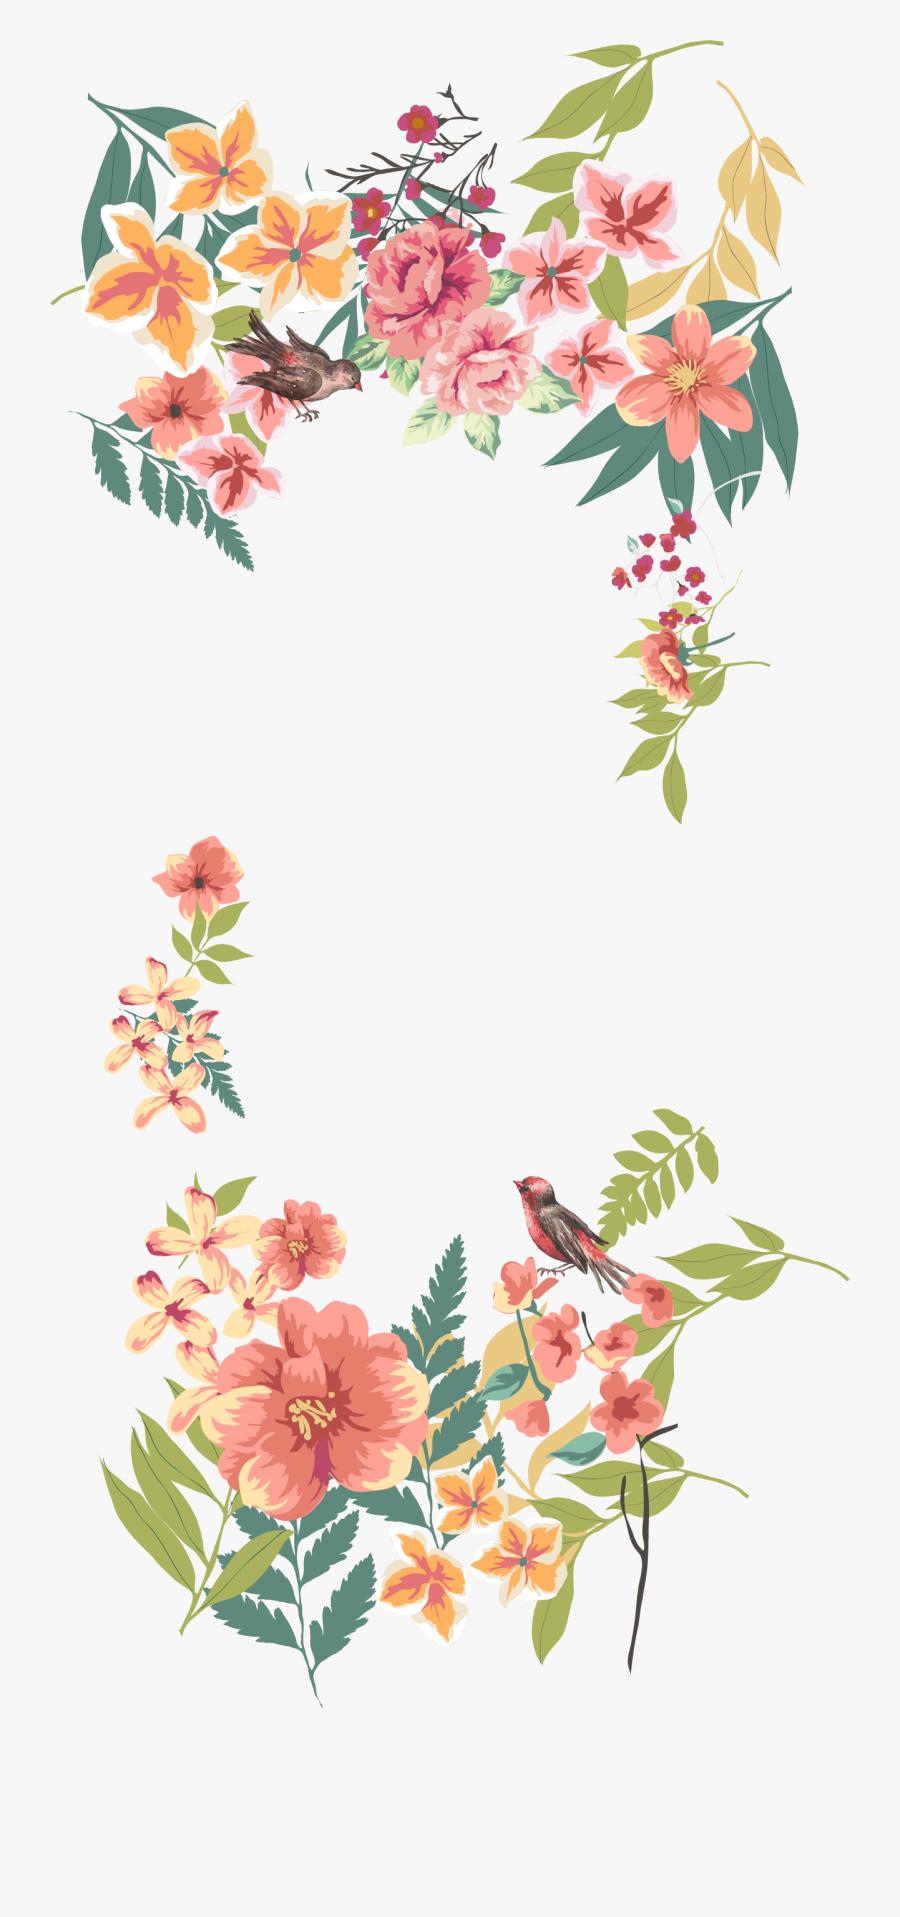 Flower Euclidean Vector Floral Design - Transparent Flower Border Vector Png, Transparent Clipart